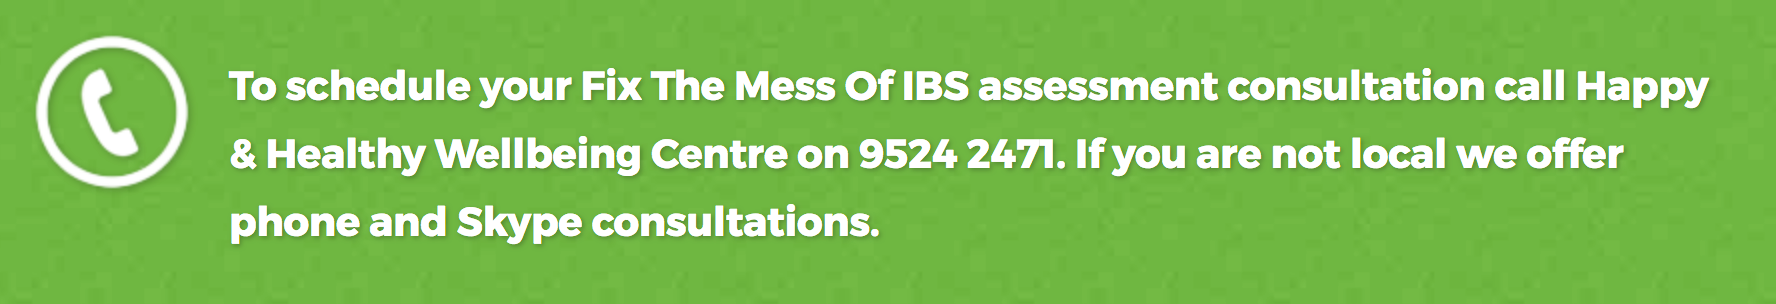 IBS-assessment